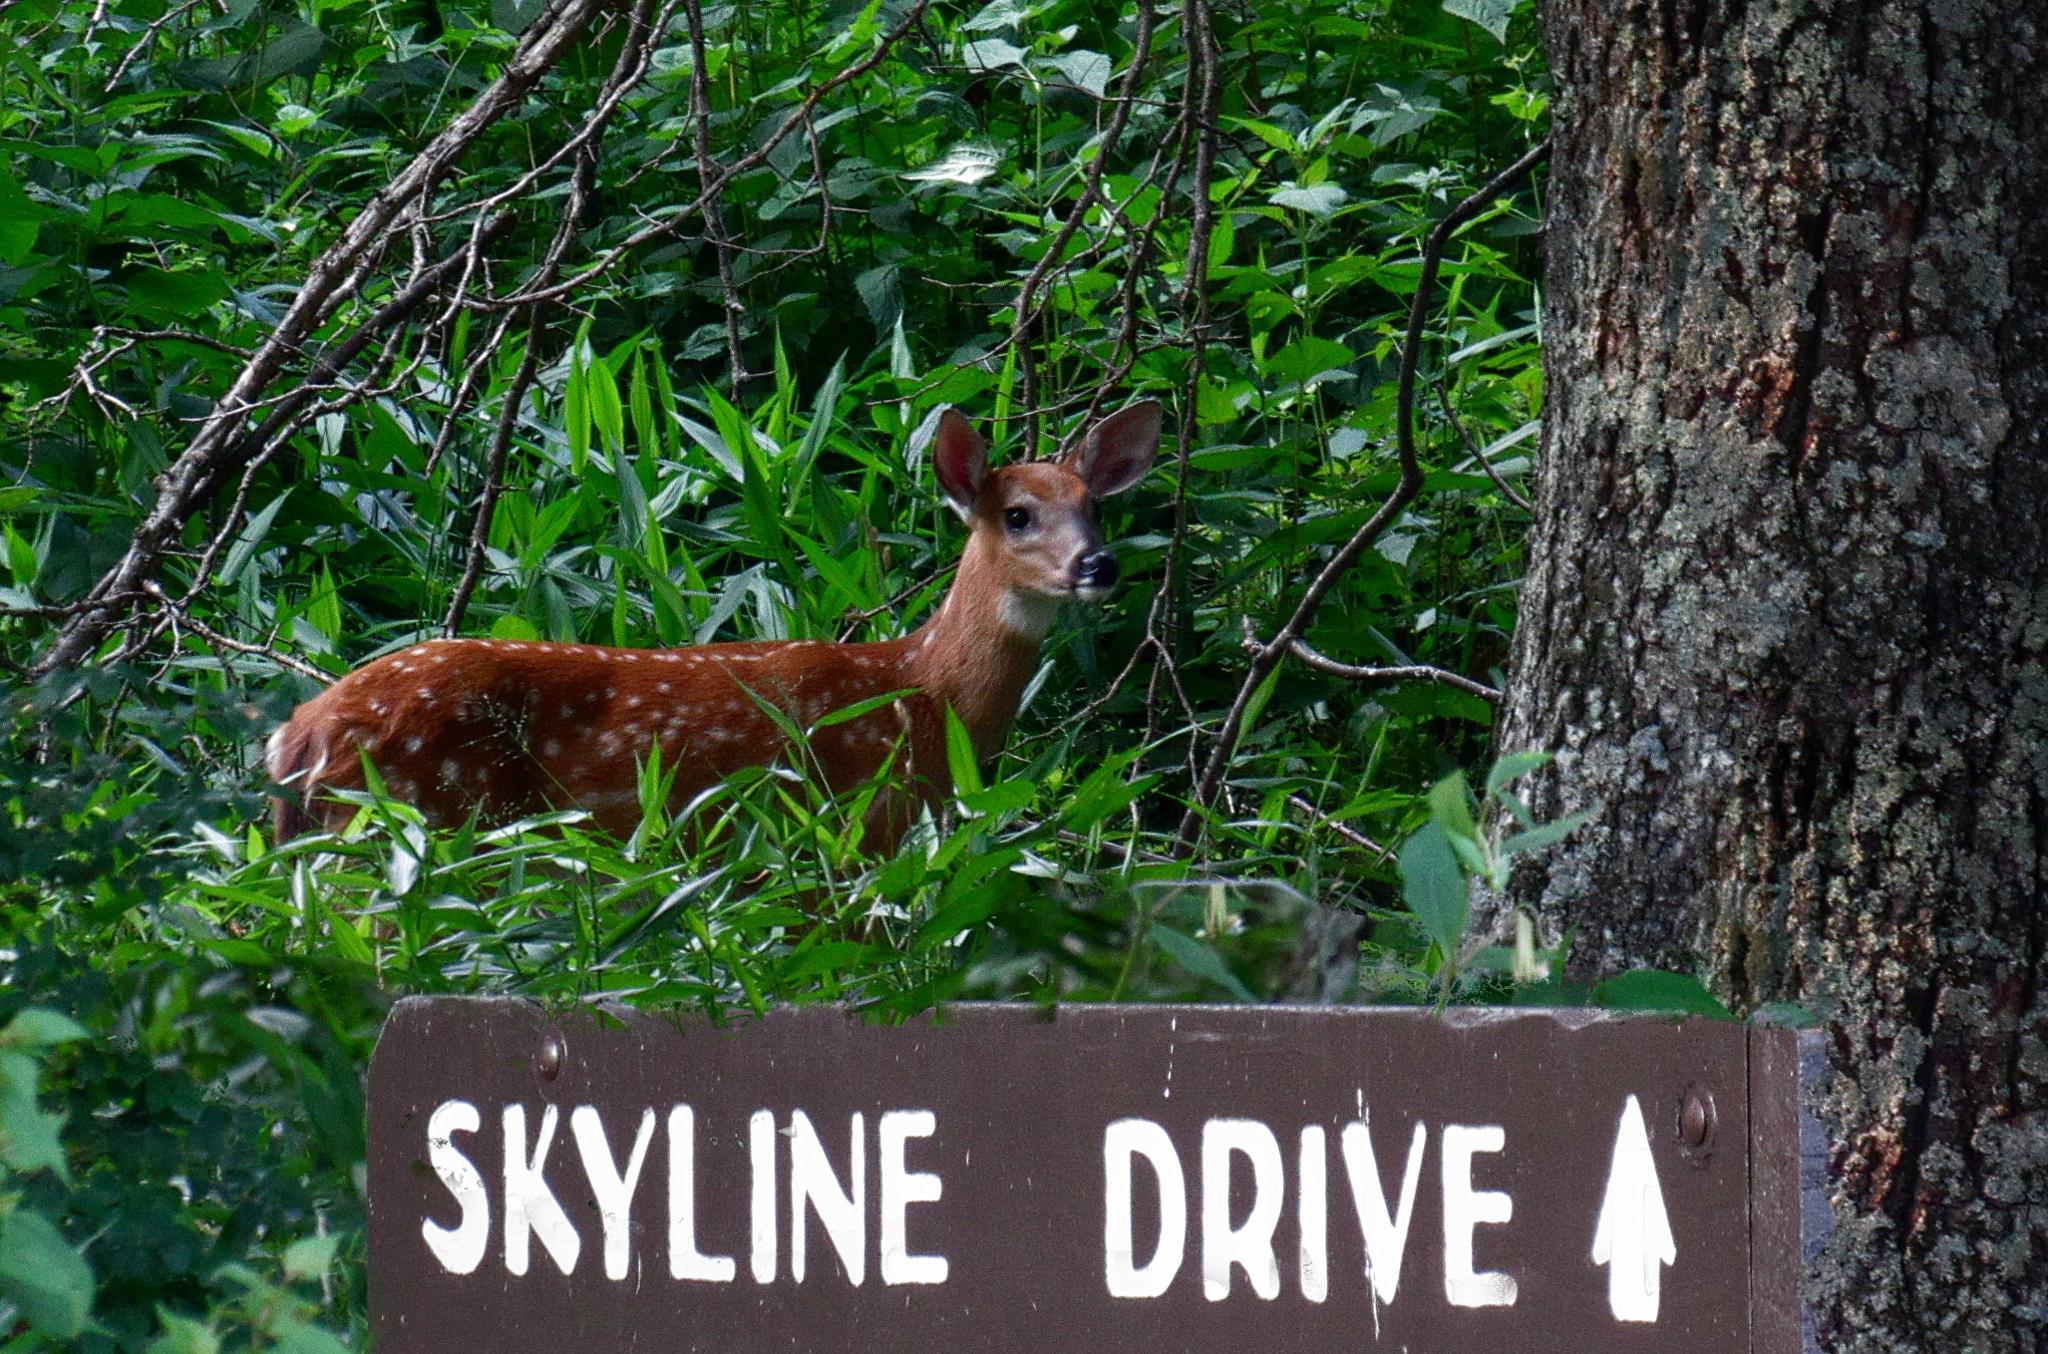 Welcome To Skyline Drive by Catherine Wegener